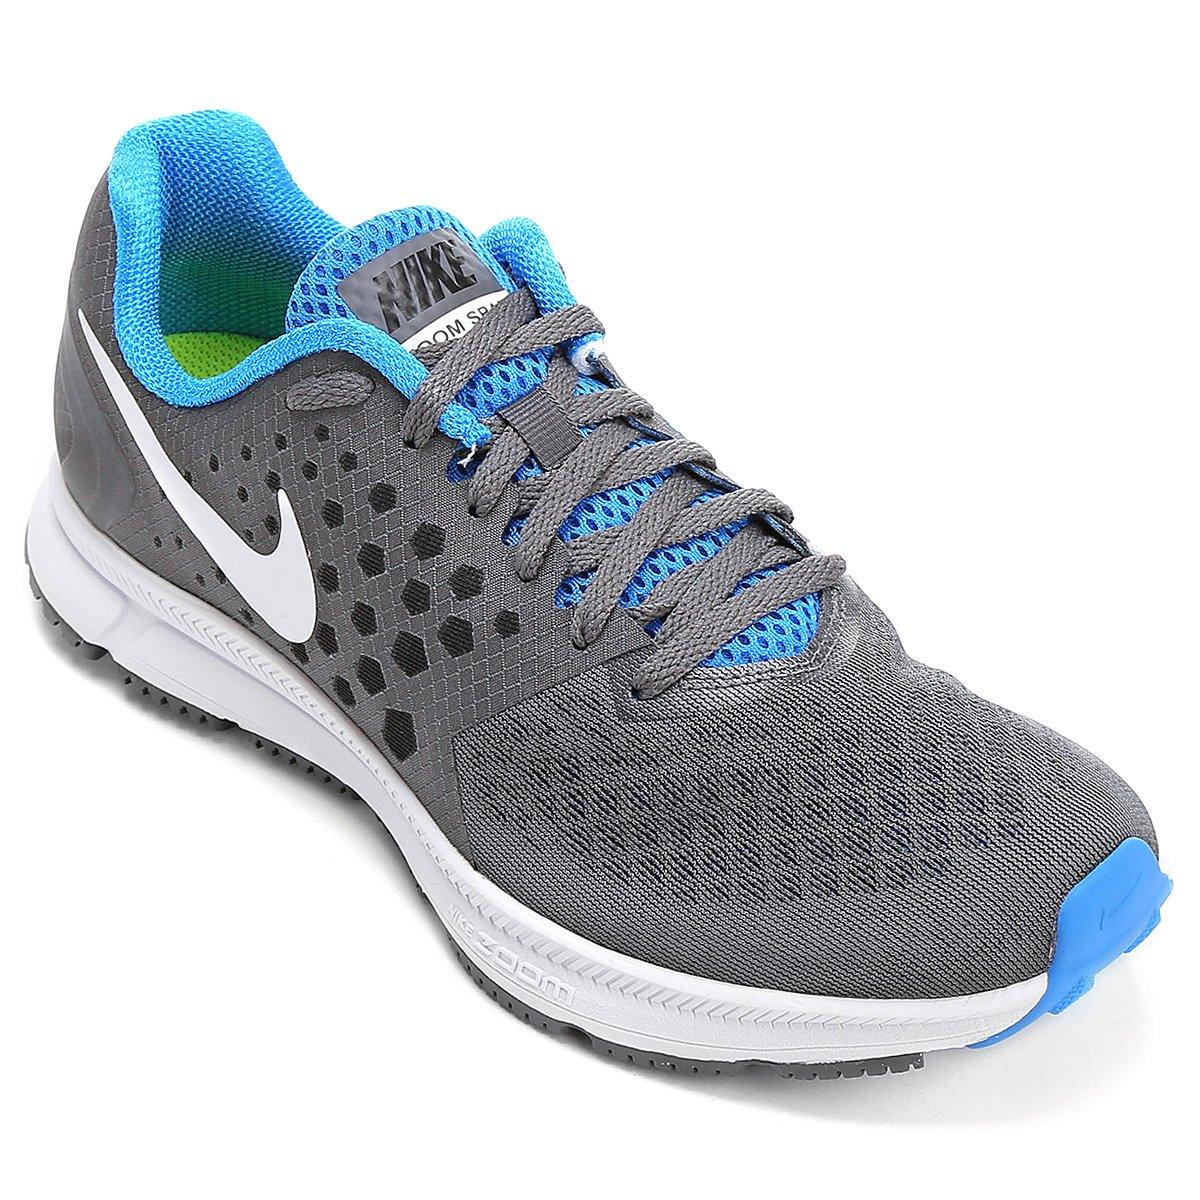 9bddedaa73 Tênis Nike Air Zoom Span Masculino   Shop Timão